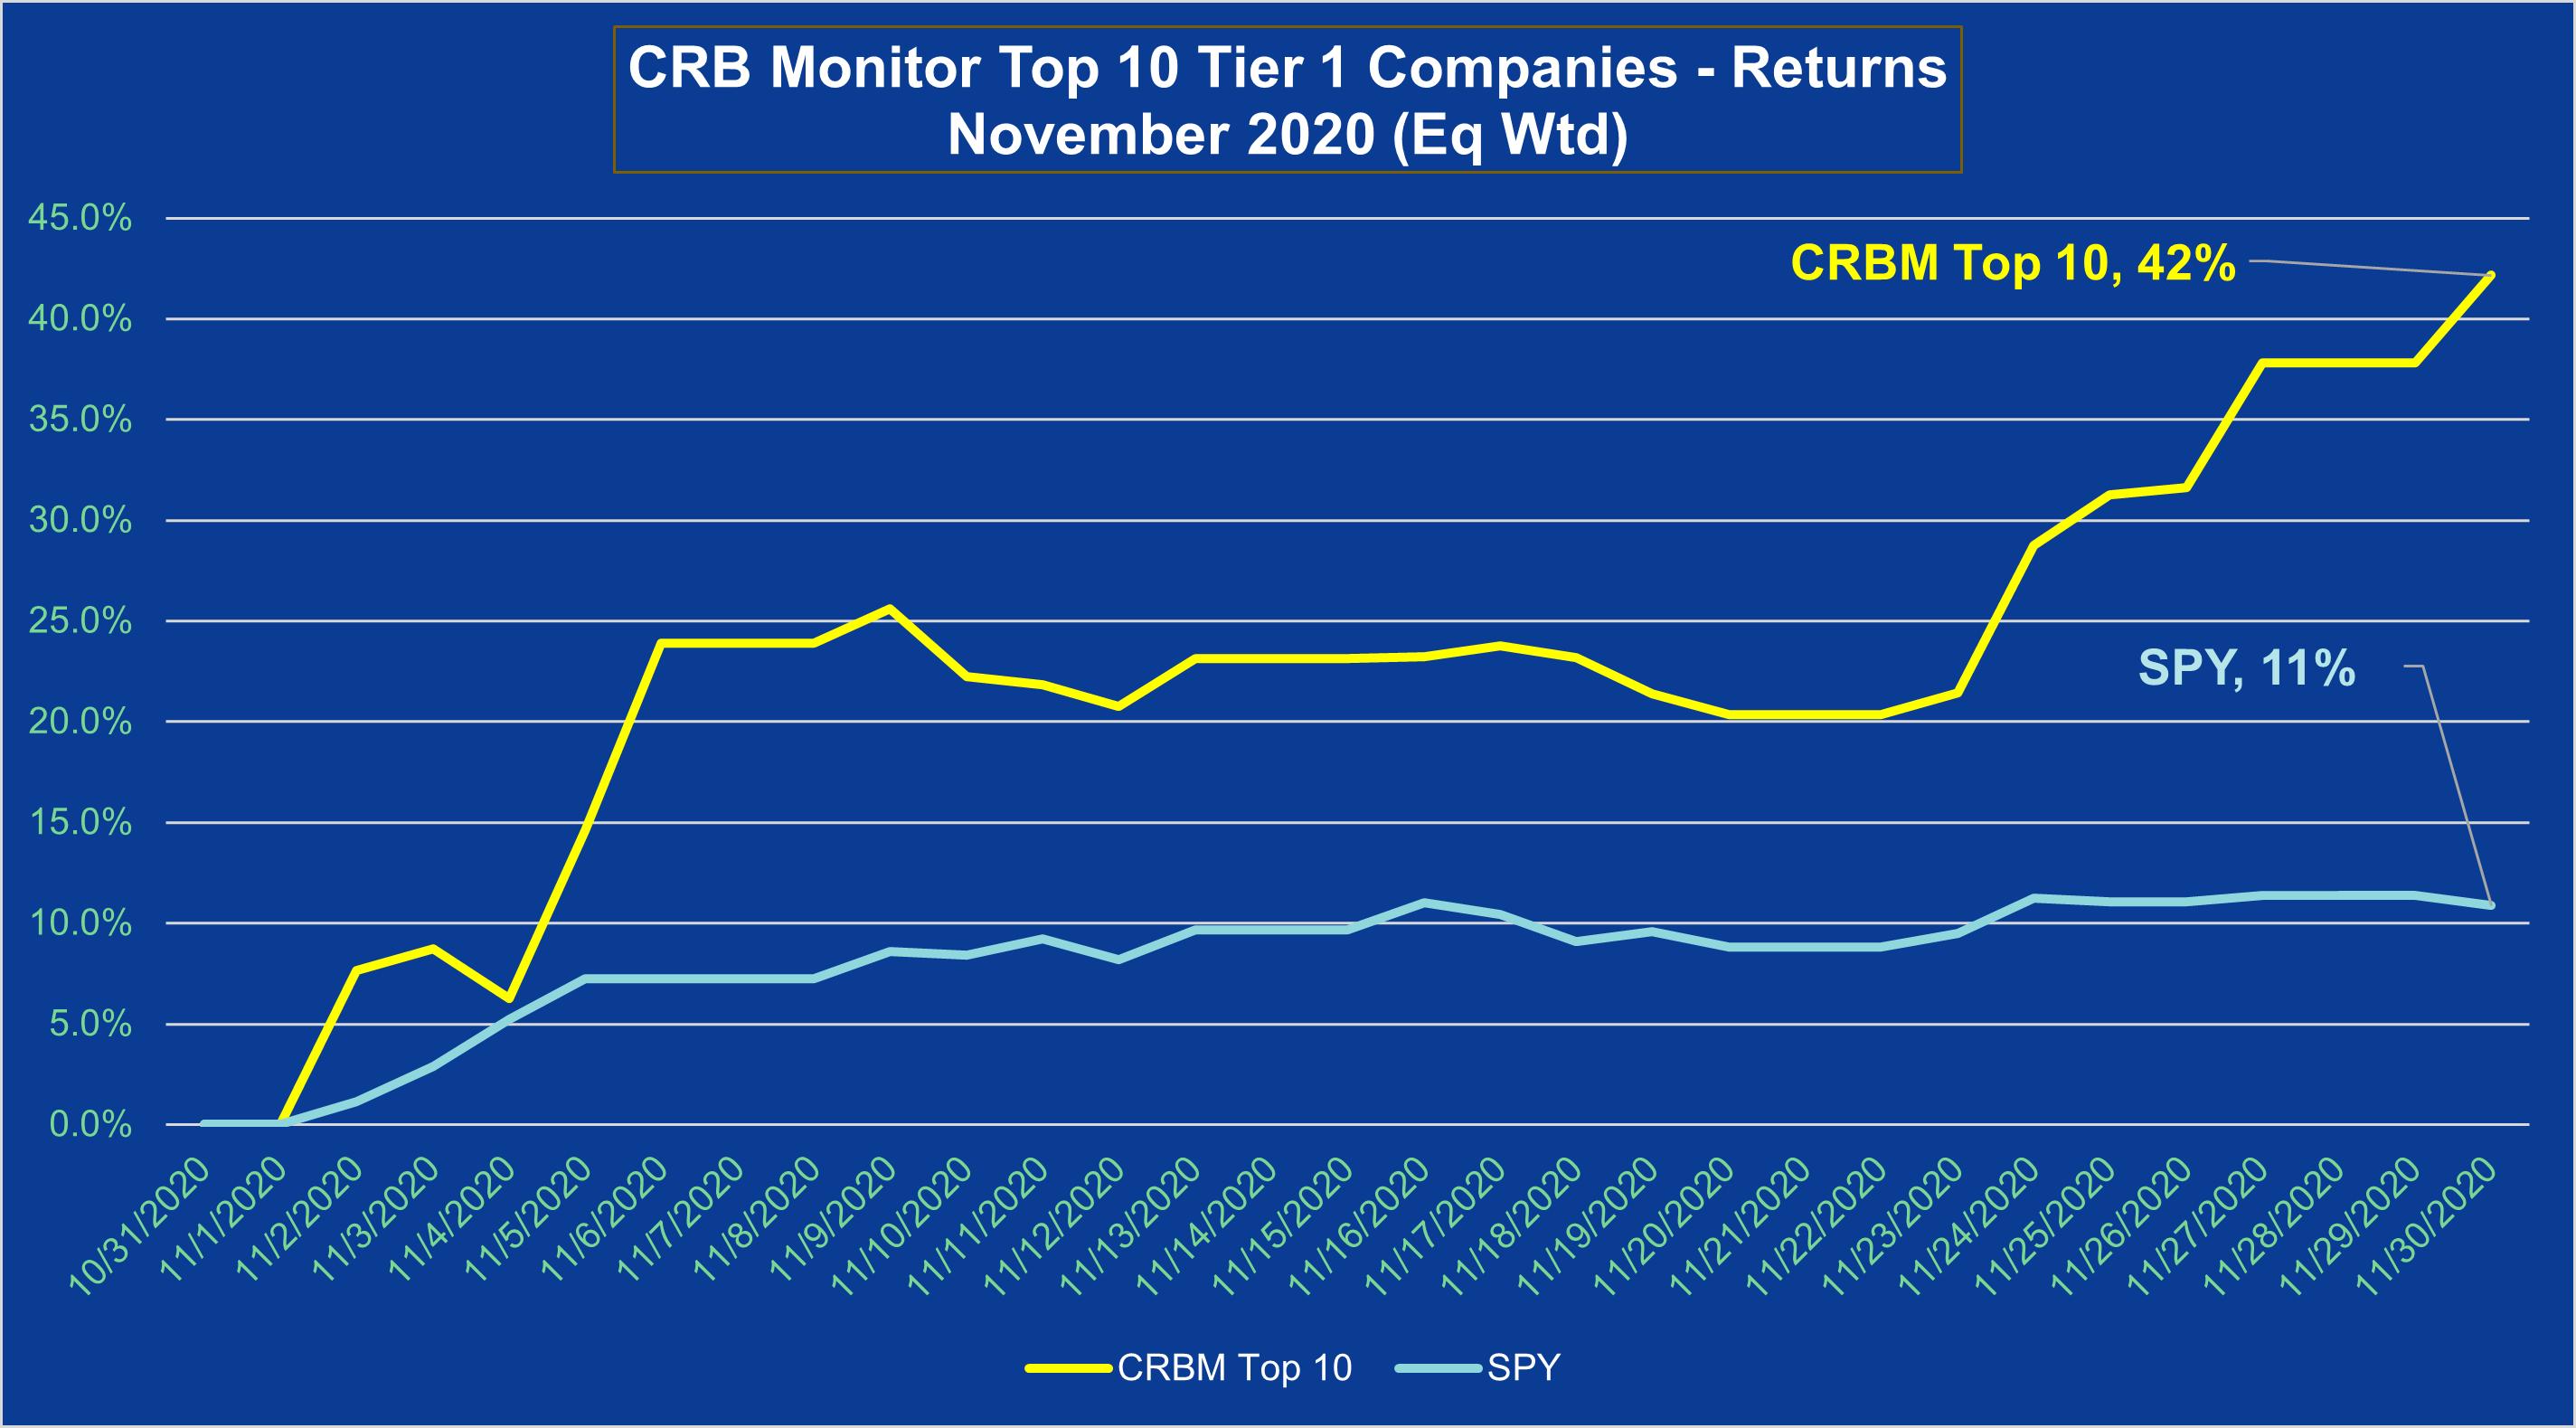 CRB November Top 10 Returns